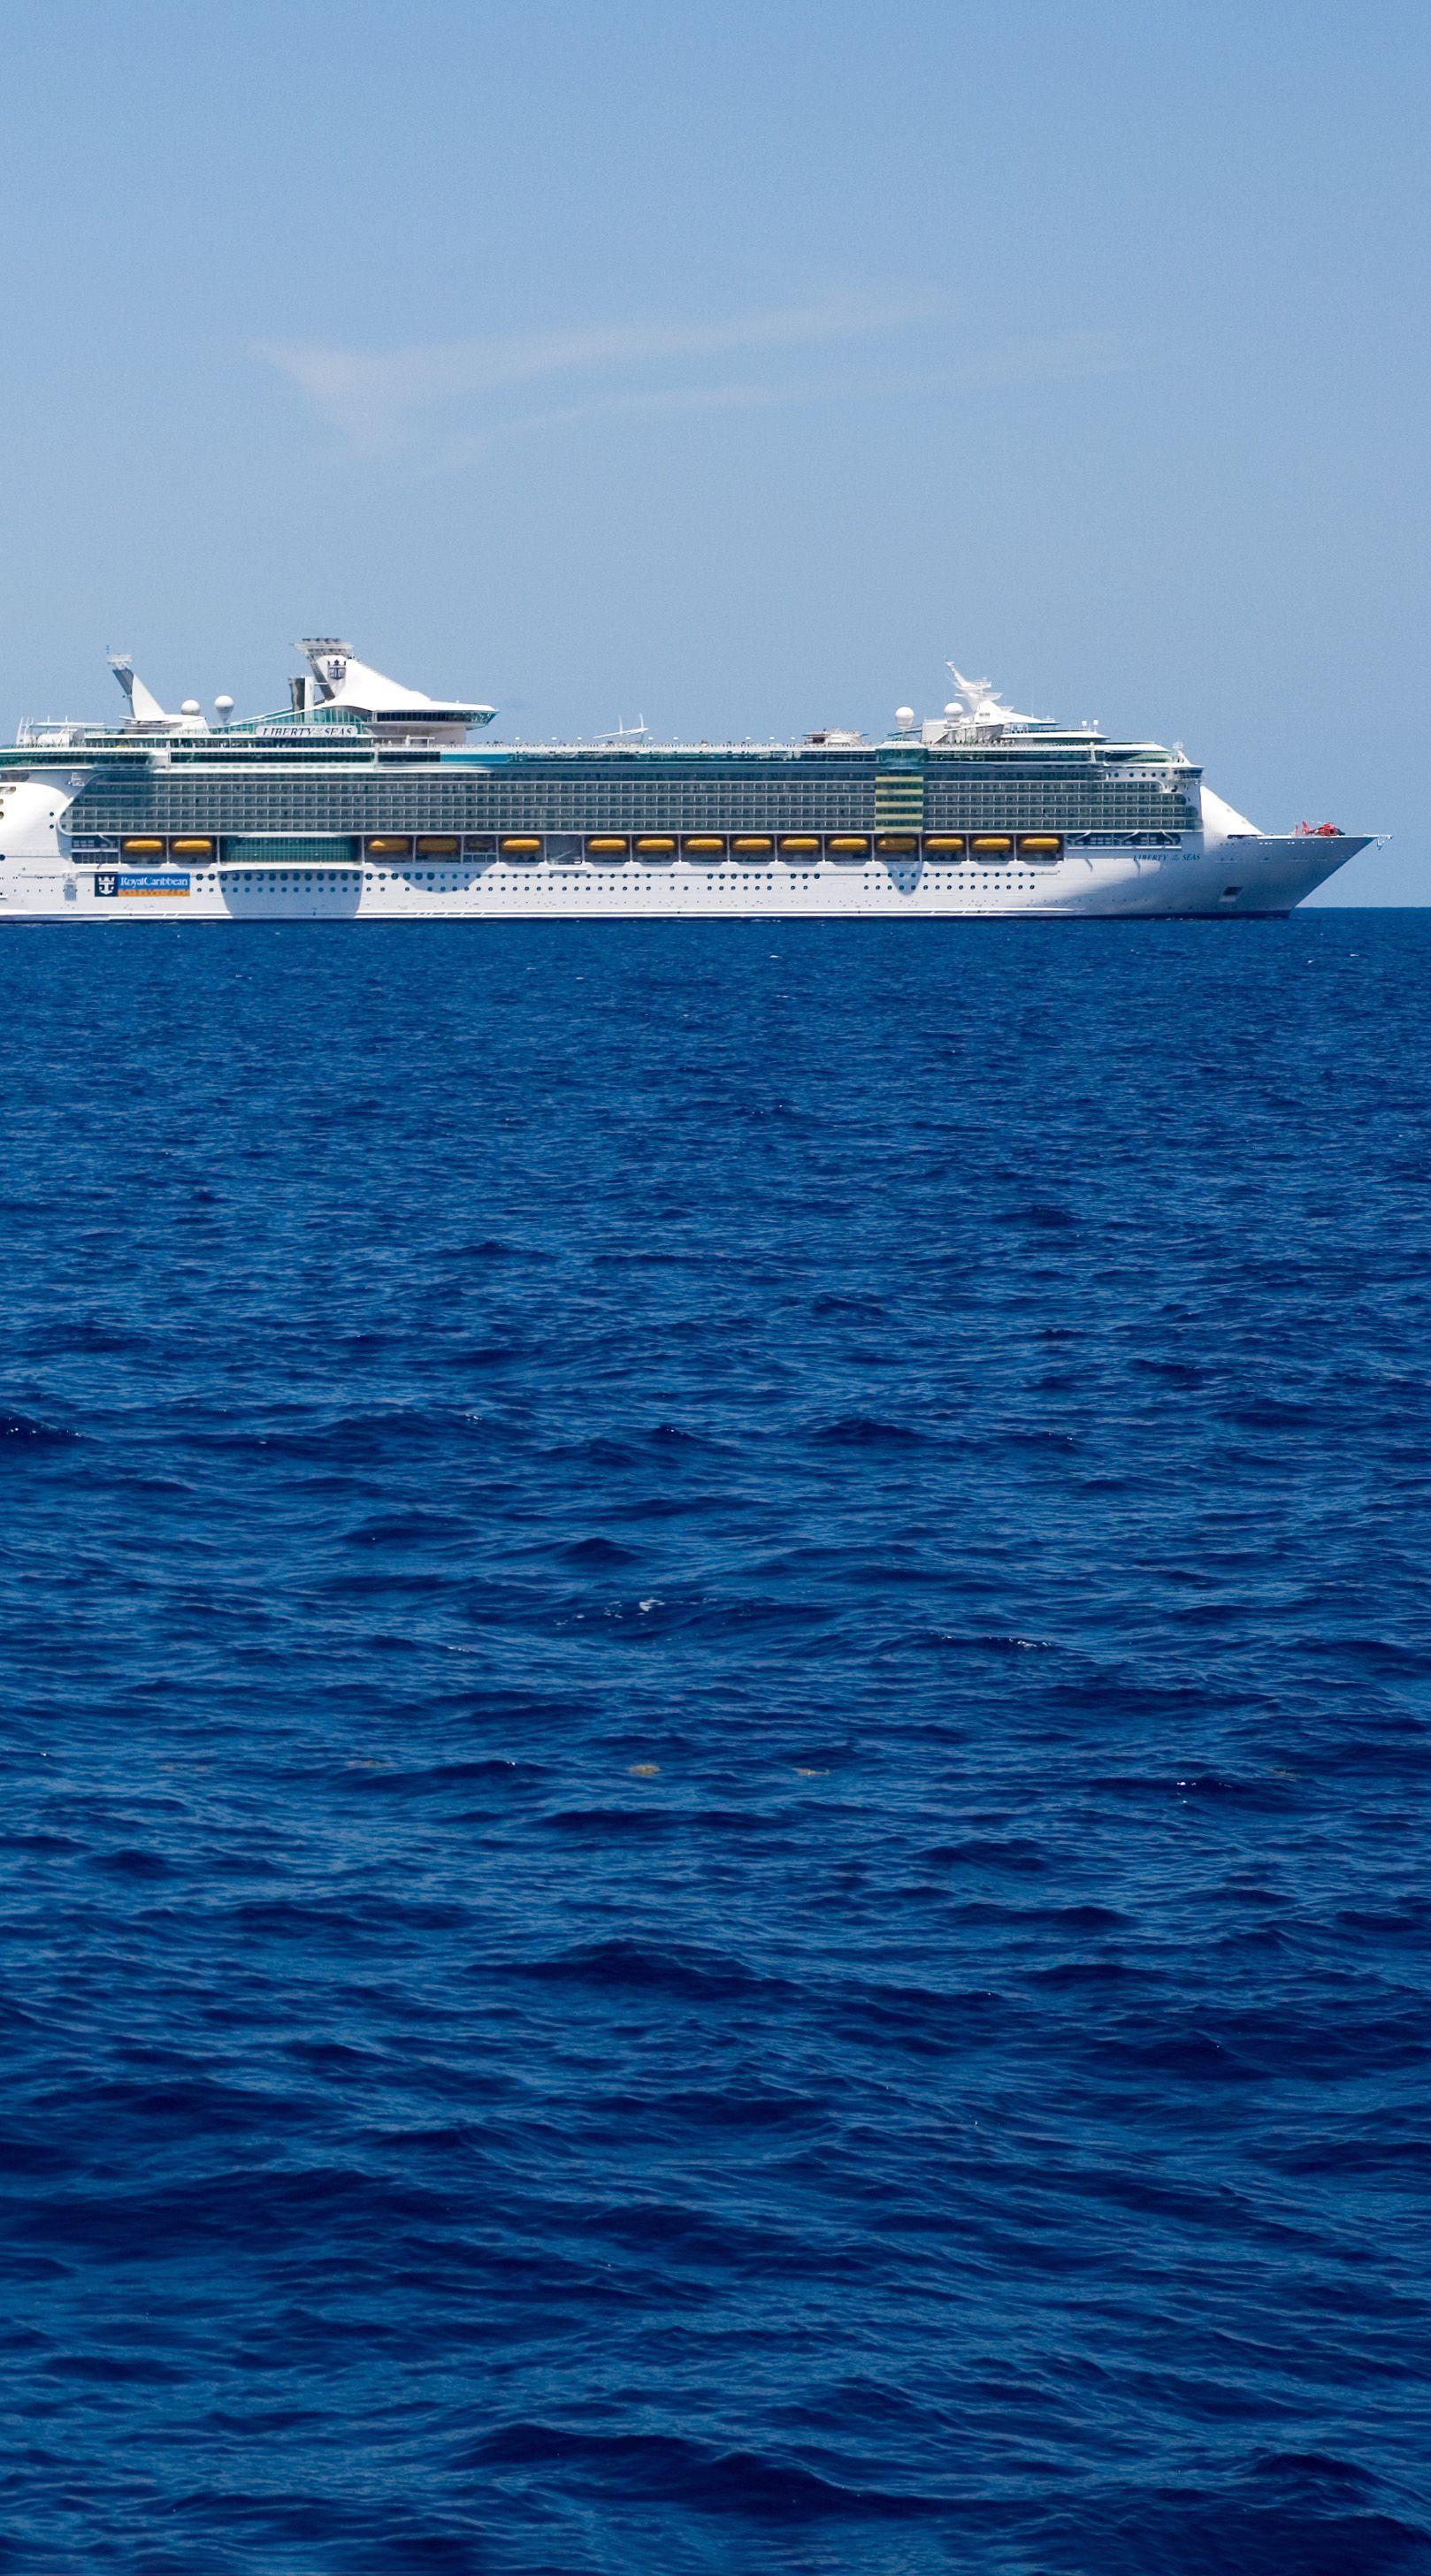 Freedom Of The Seas Cruise Ship Royal Caribbean Cruise Lines Royal Caribbean Cruise